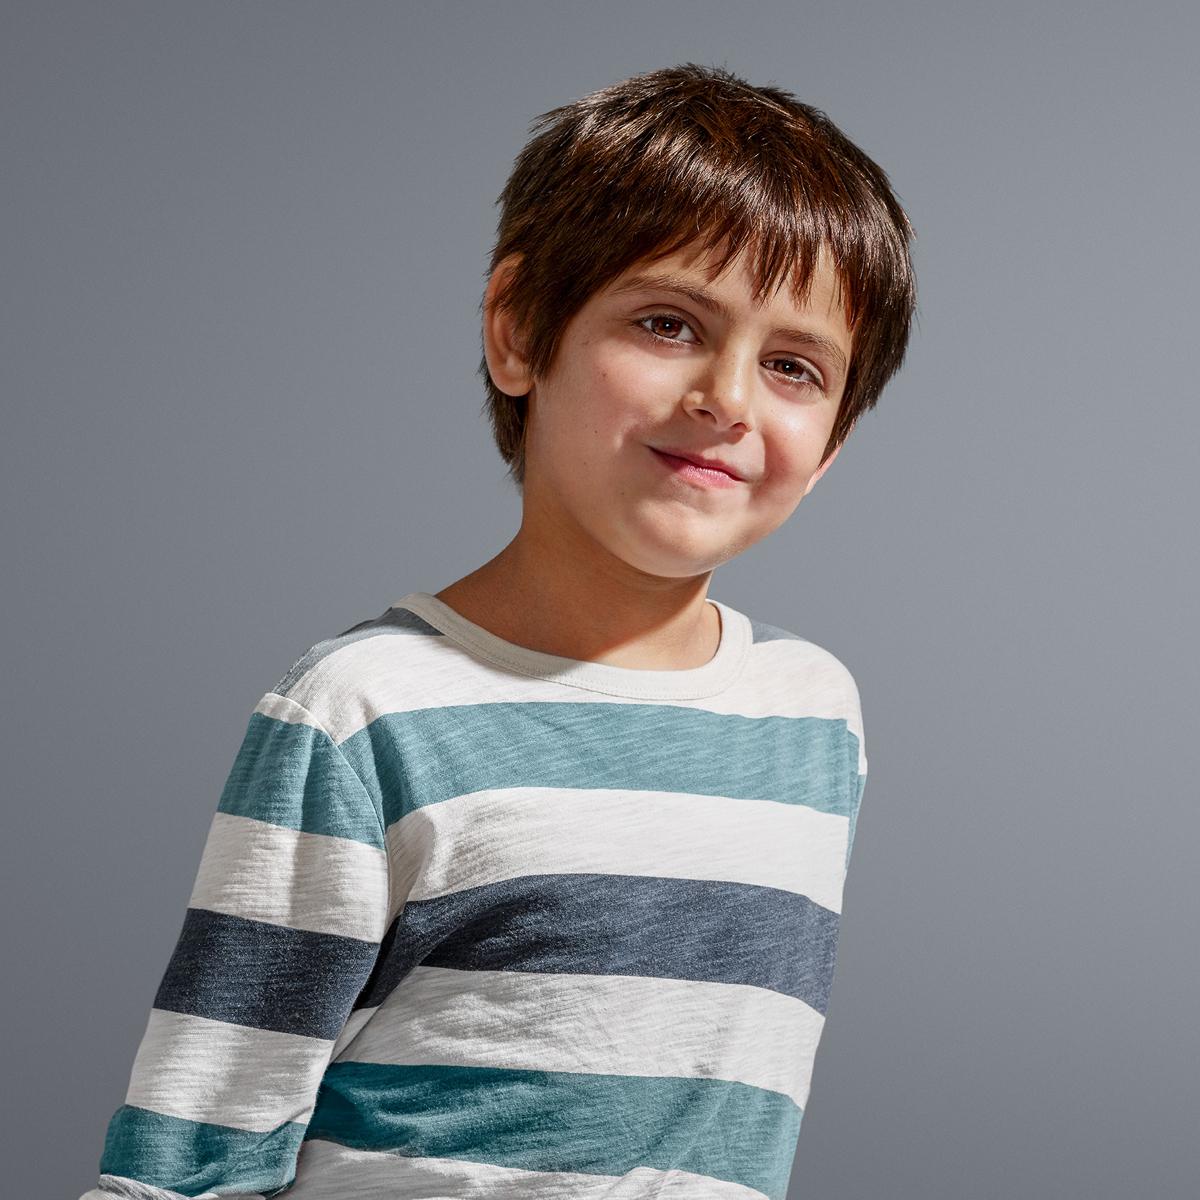 NYP Kids Portraits_0000_Layer Comp 1.jpg